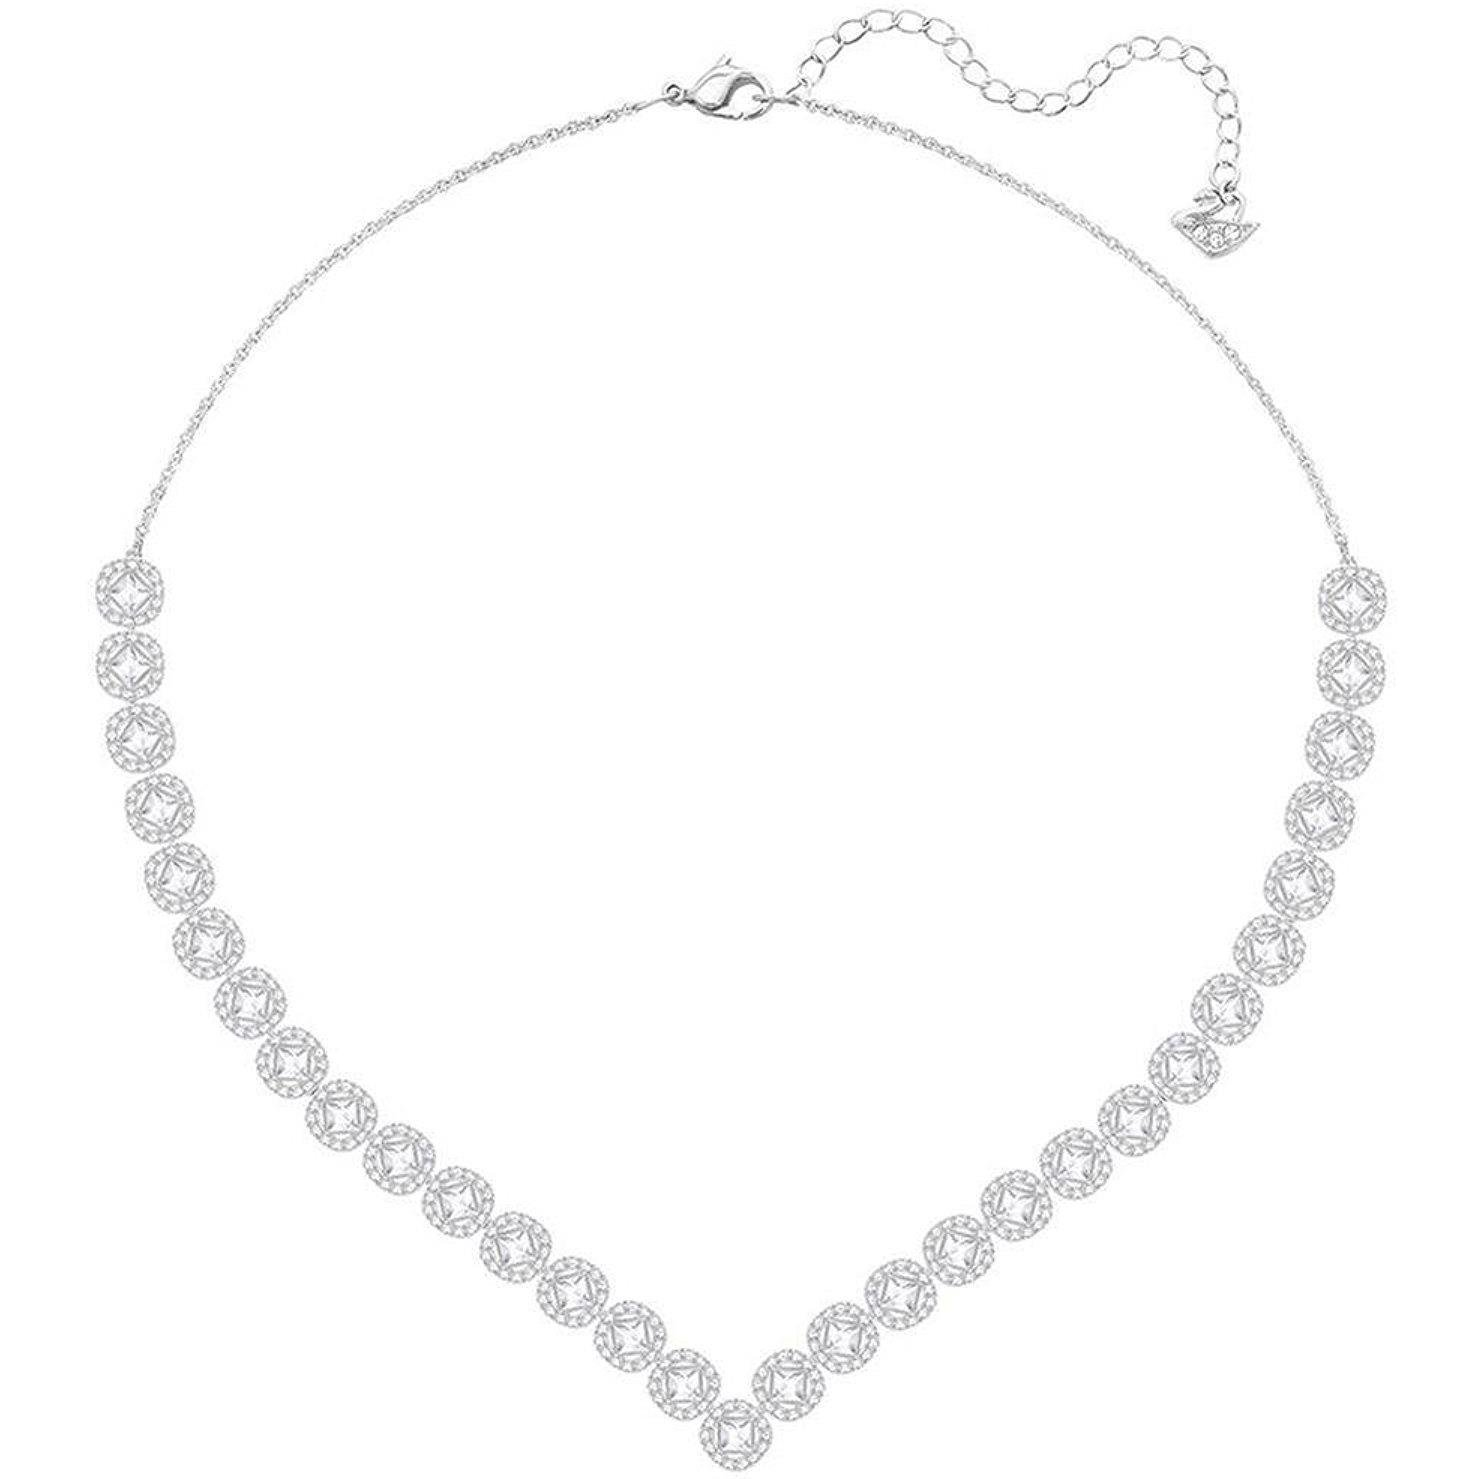 Swarovski Crystal Large White Angelic Square Rhodium-Plated Necklace by Swarovski